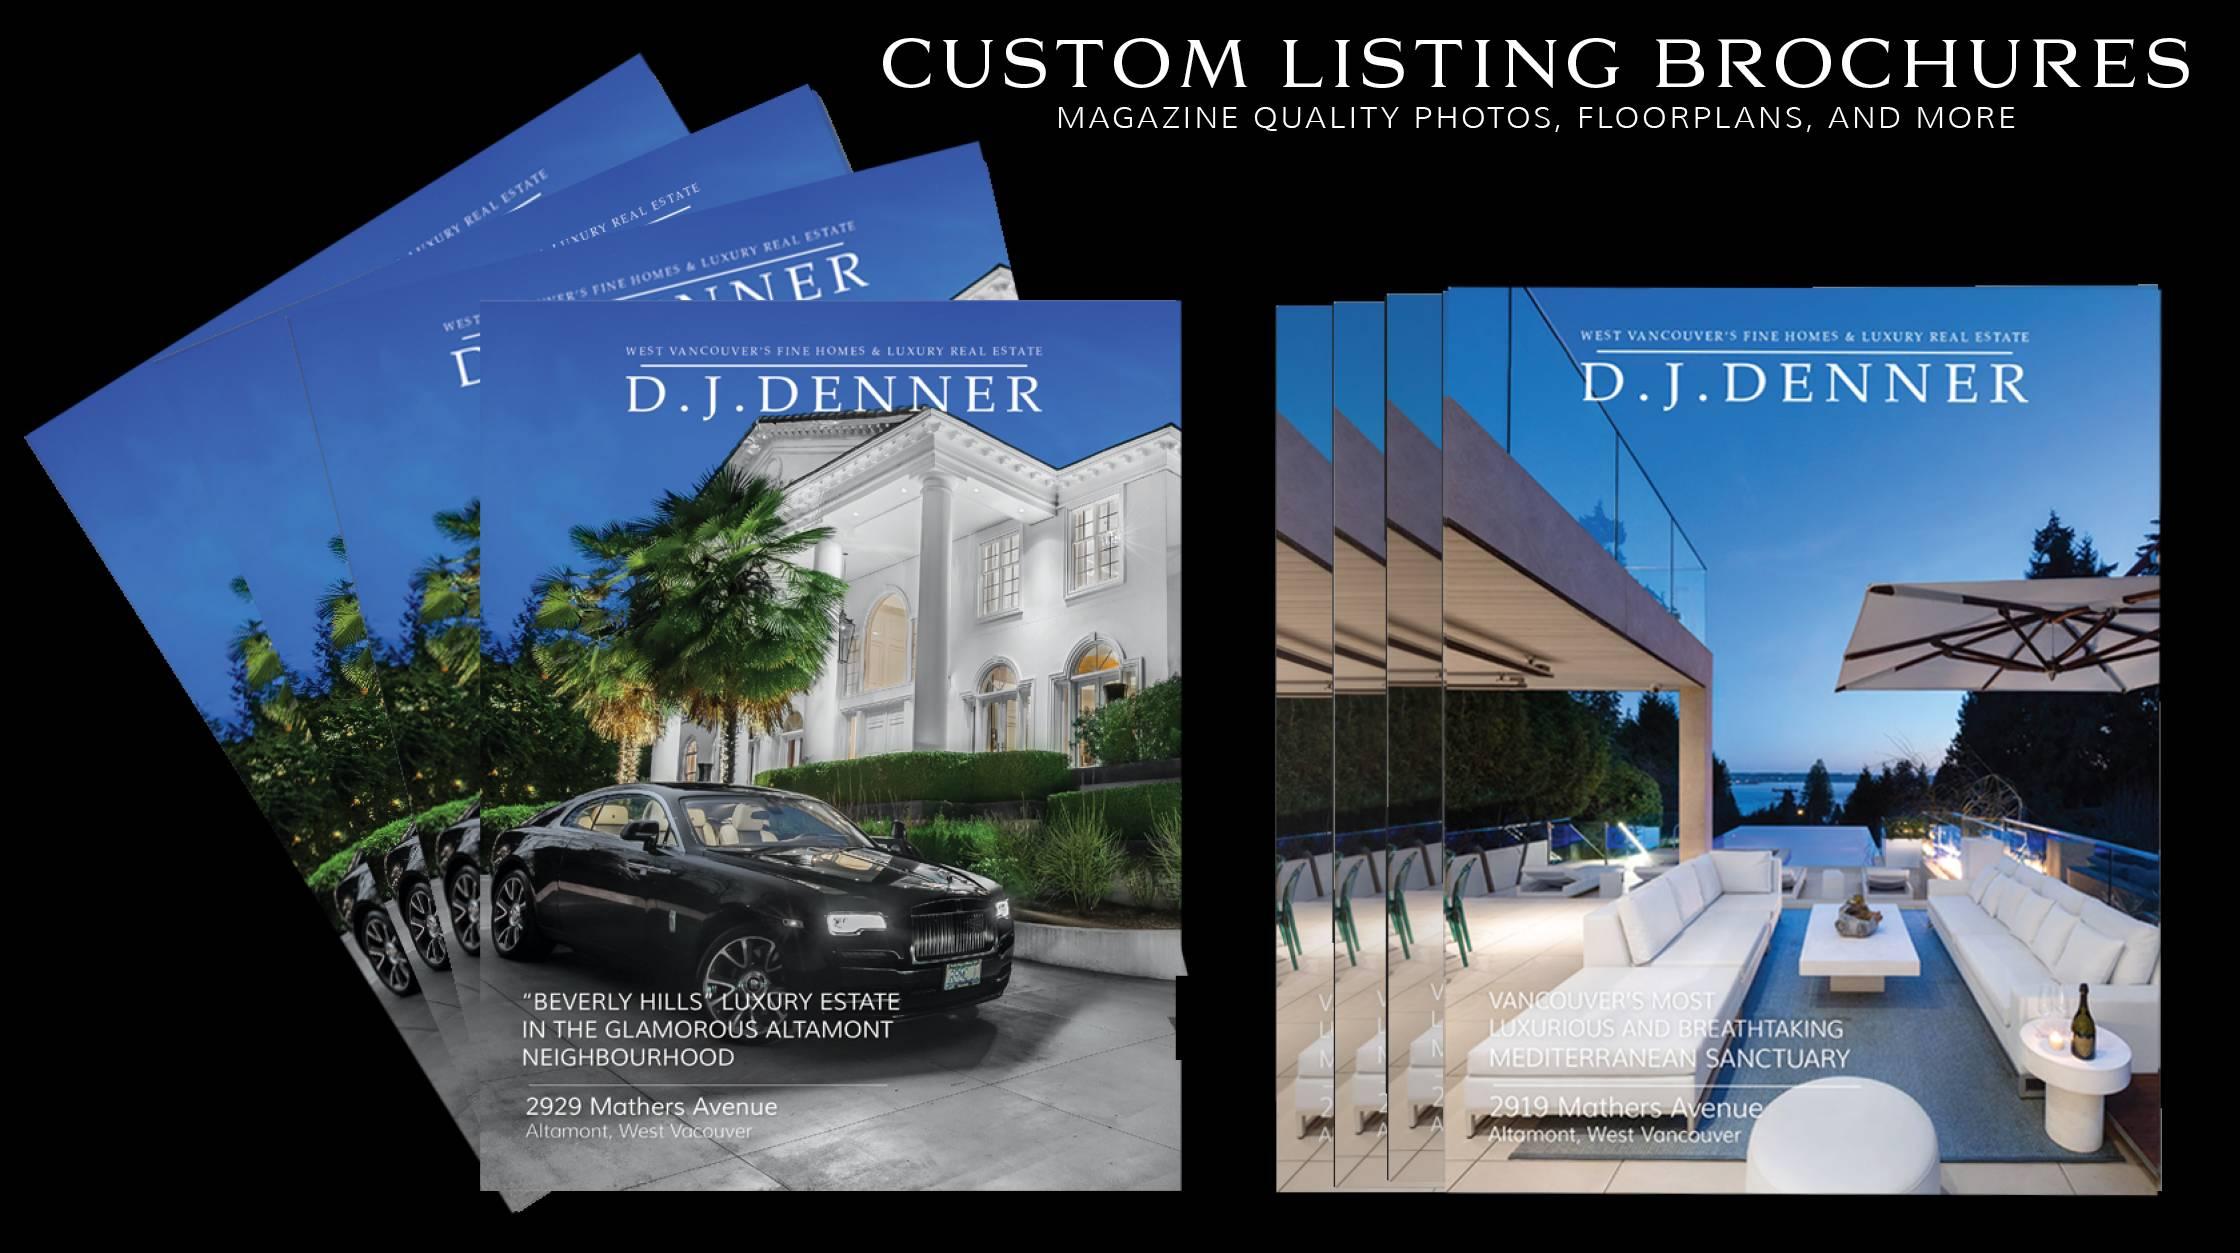 Brochures For Real Estate Kleobeachfixco - Luxury real estate brochure templates